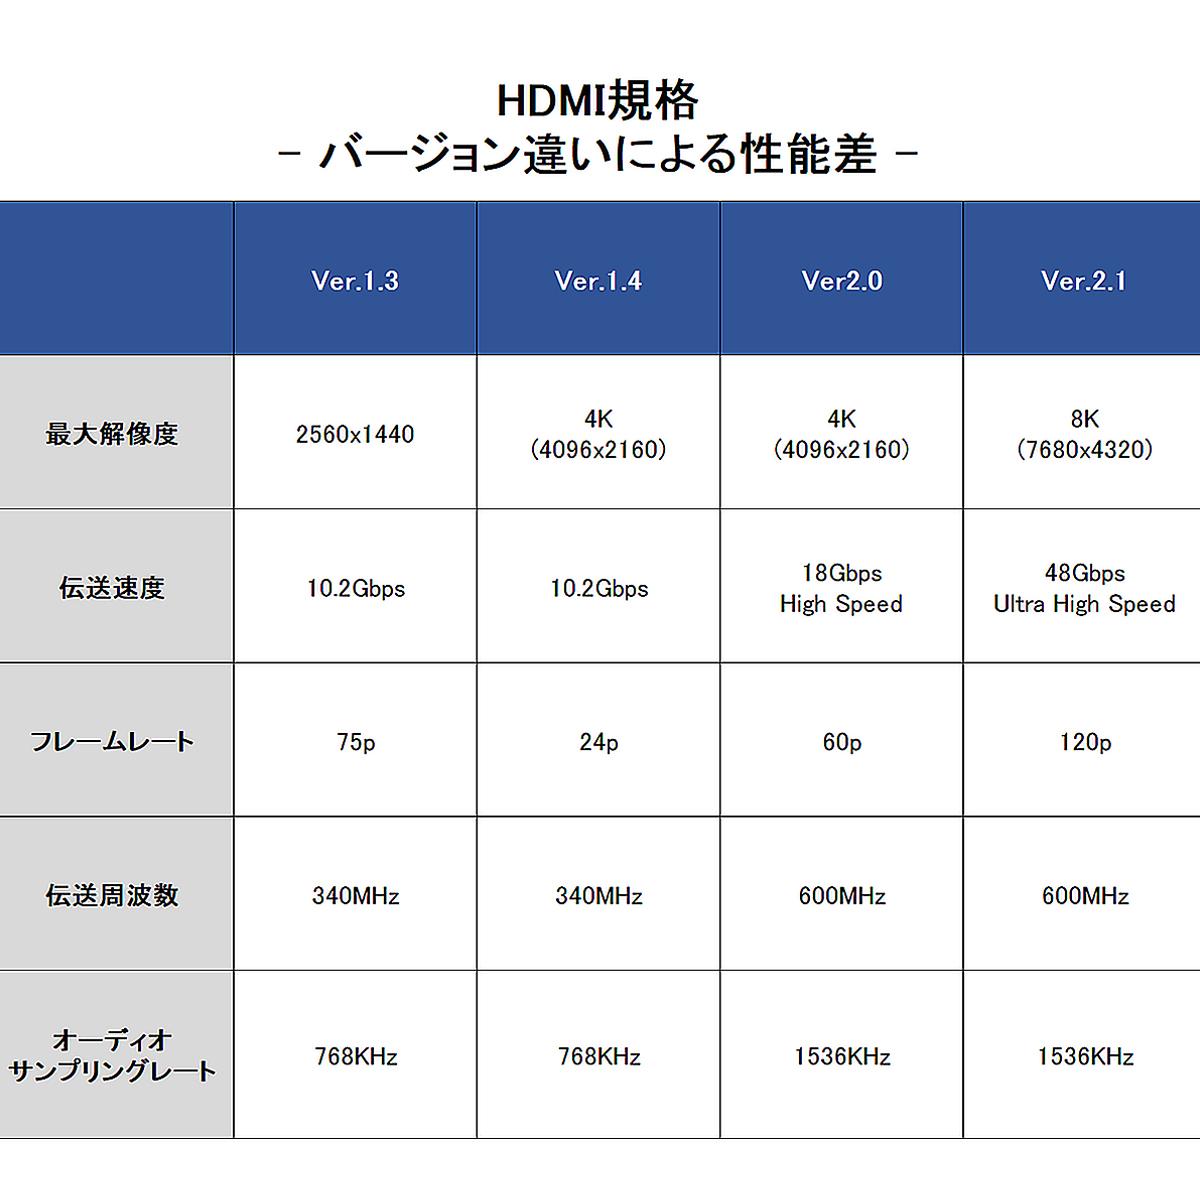 HDMIケーブル 2本セット ハイスピード Ver2.0 4K/60p UltraHD HDR 3D FHD HEC ARC 1.2m タイプAオス-タイプAオス 黒 SDM便送料無料 1ヶ月保証 K&M